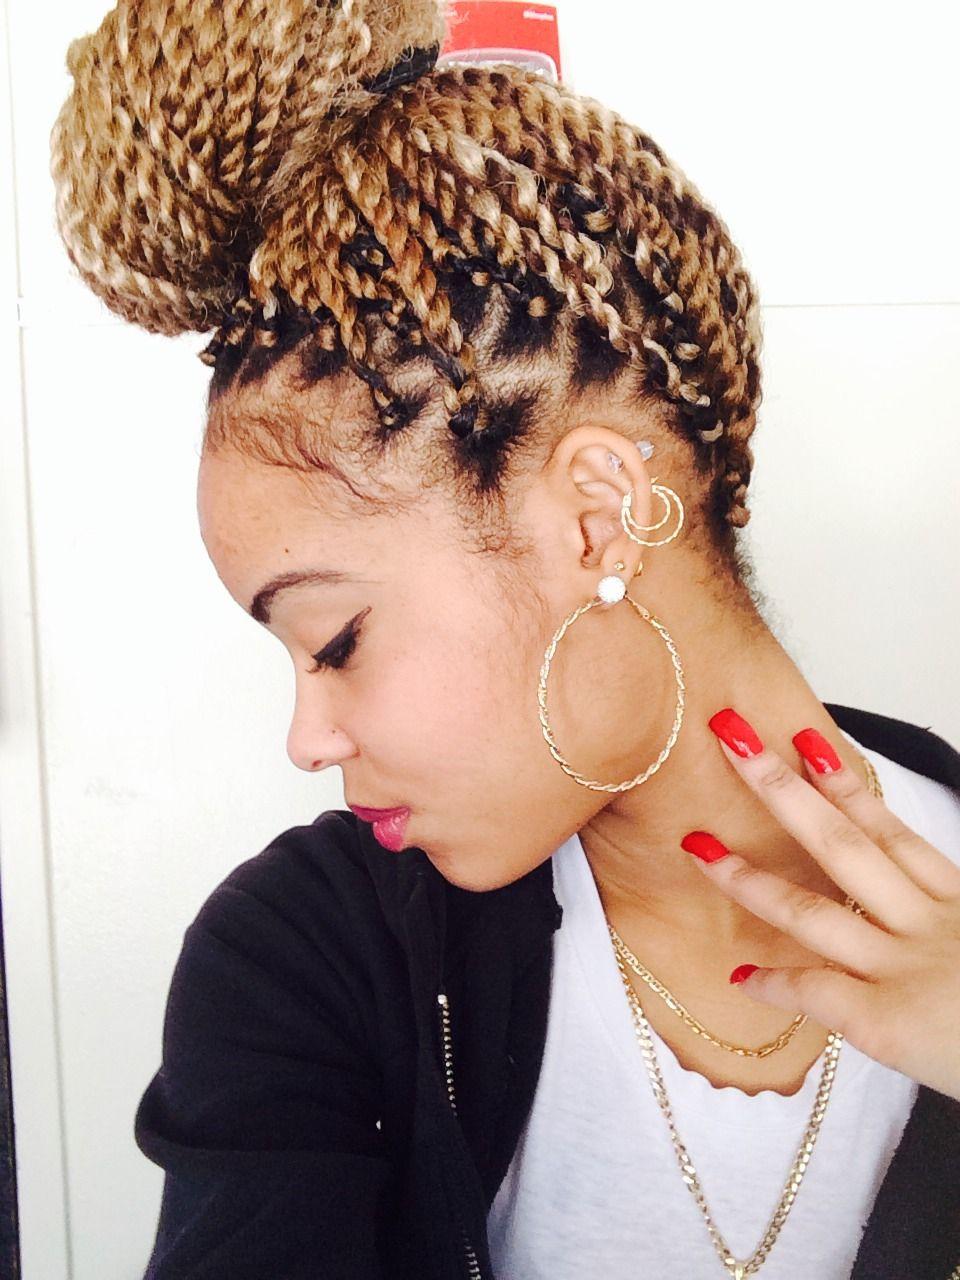 Groovy 1000 Images About Lovely African Braids On Pinterest Havana Short Hairstyles For Black Women Fulllsitofus